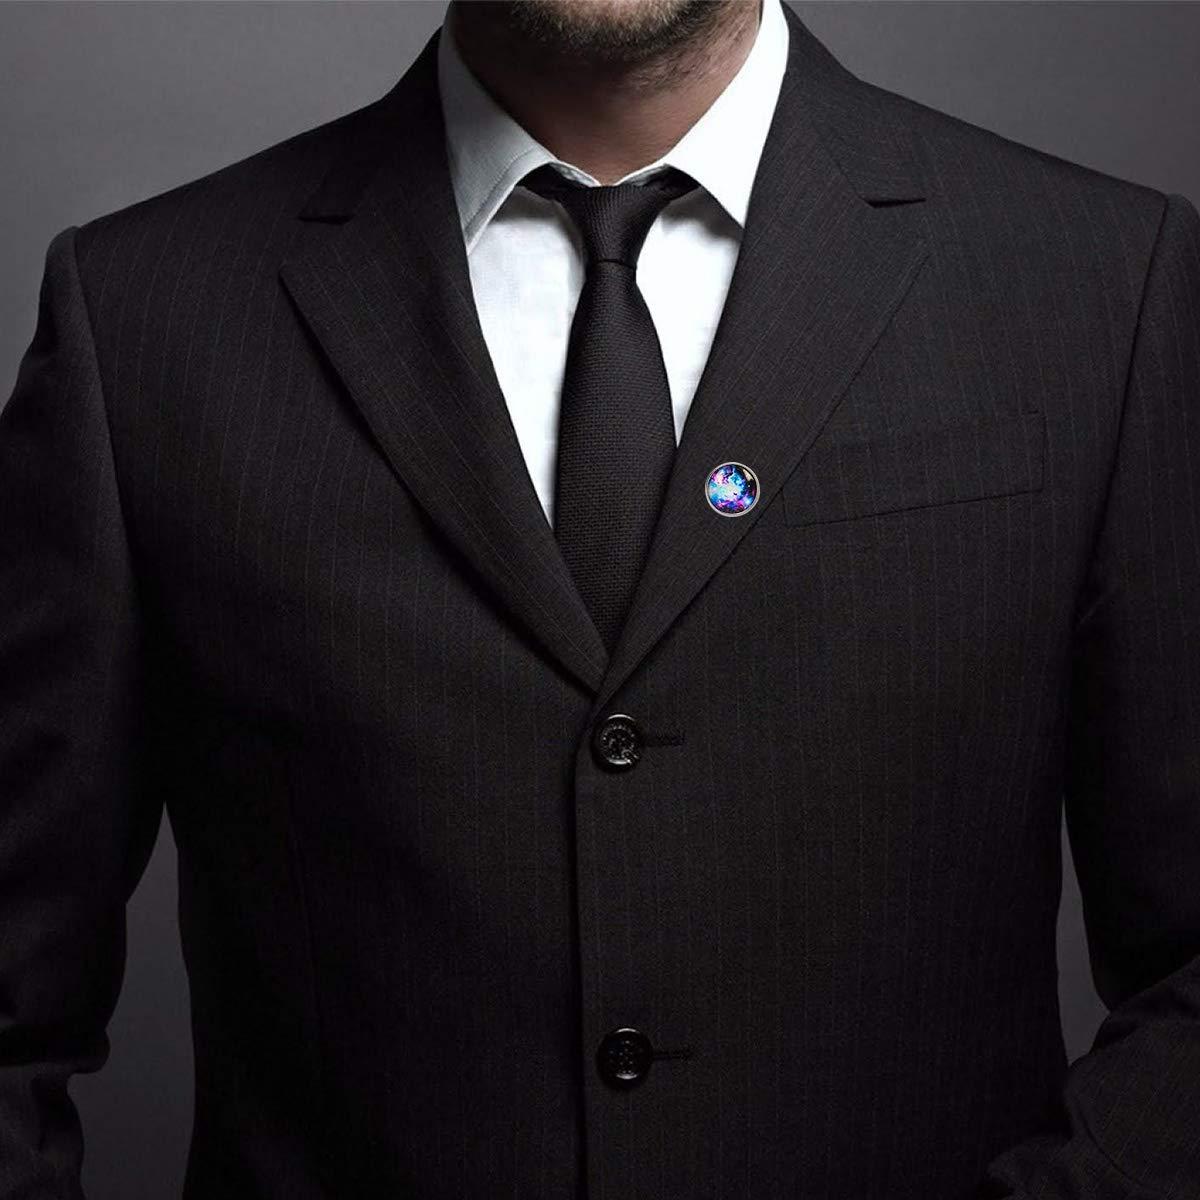 WAZZIT Round Metal Tie Tack Hat Lapel Pin Brooches Vintage Galaxy Banquet Badge Enamel Pins Trendy Accessory Jacket T-Shirt